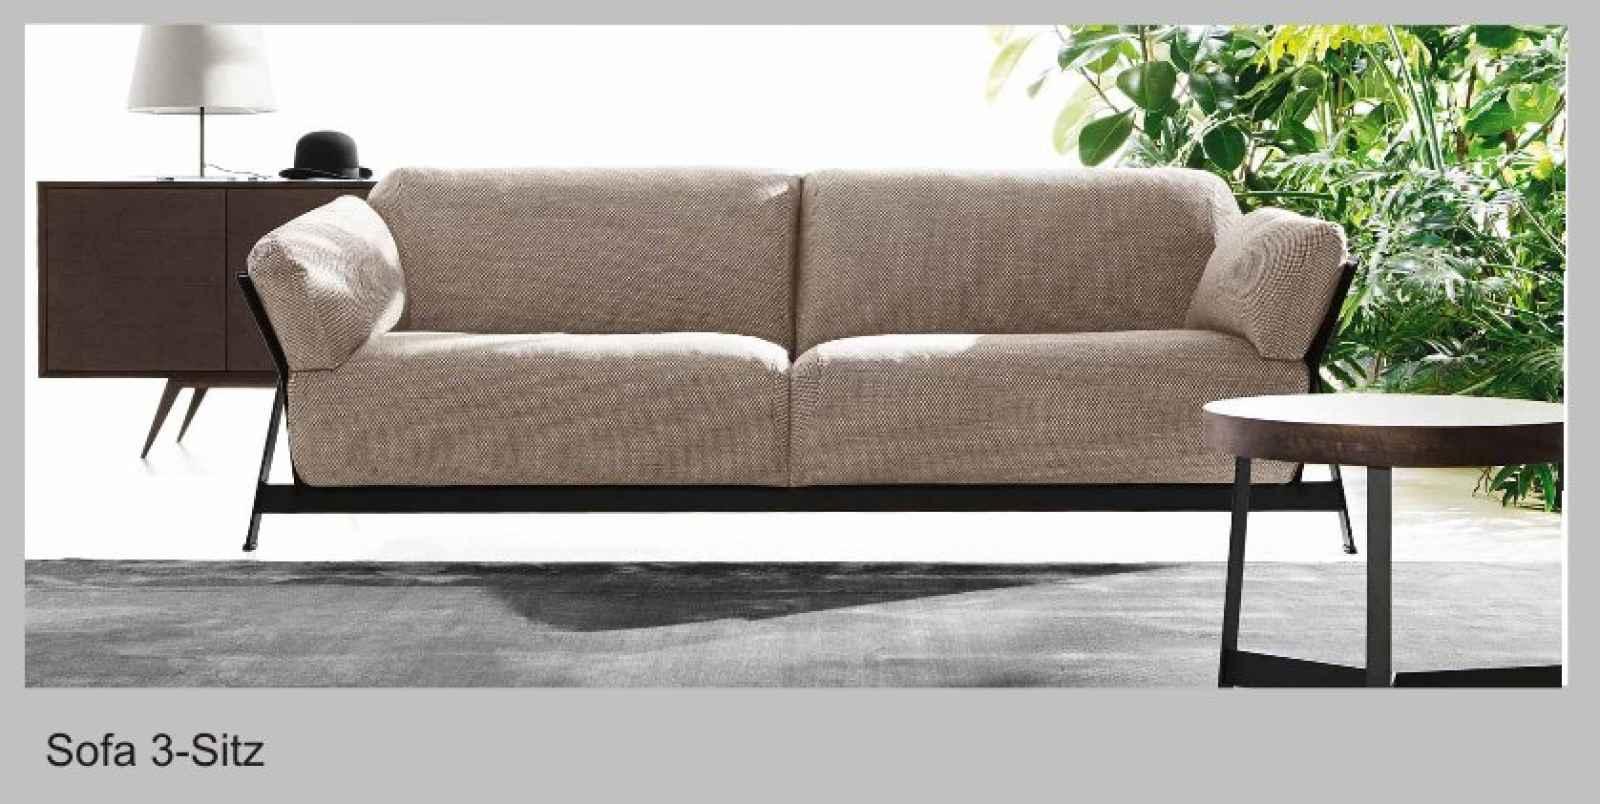 Sofa 8590 ditreitalia kanaha the lounge company - Gienne divani letto ...